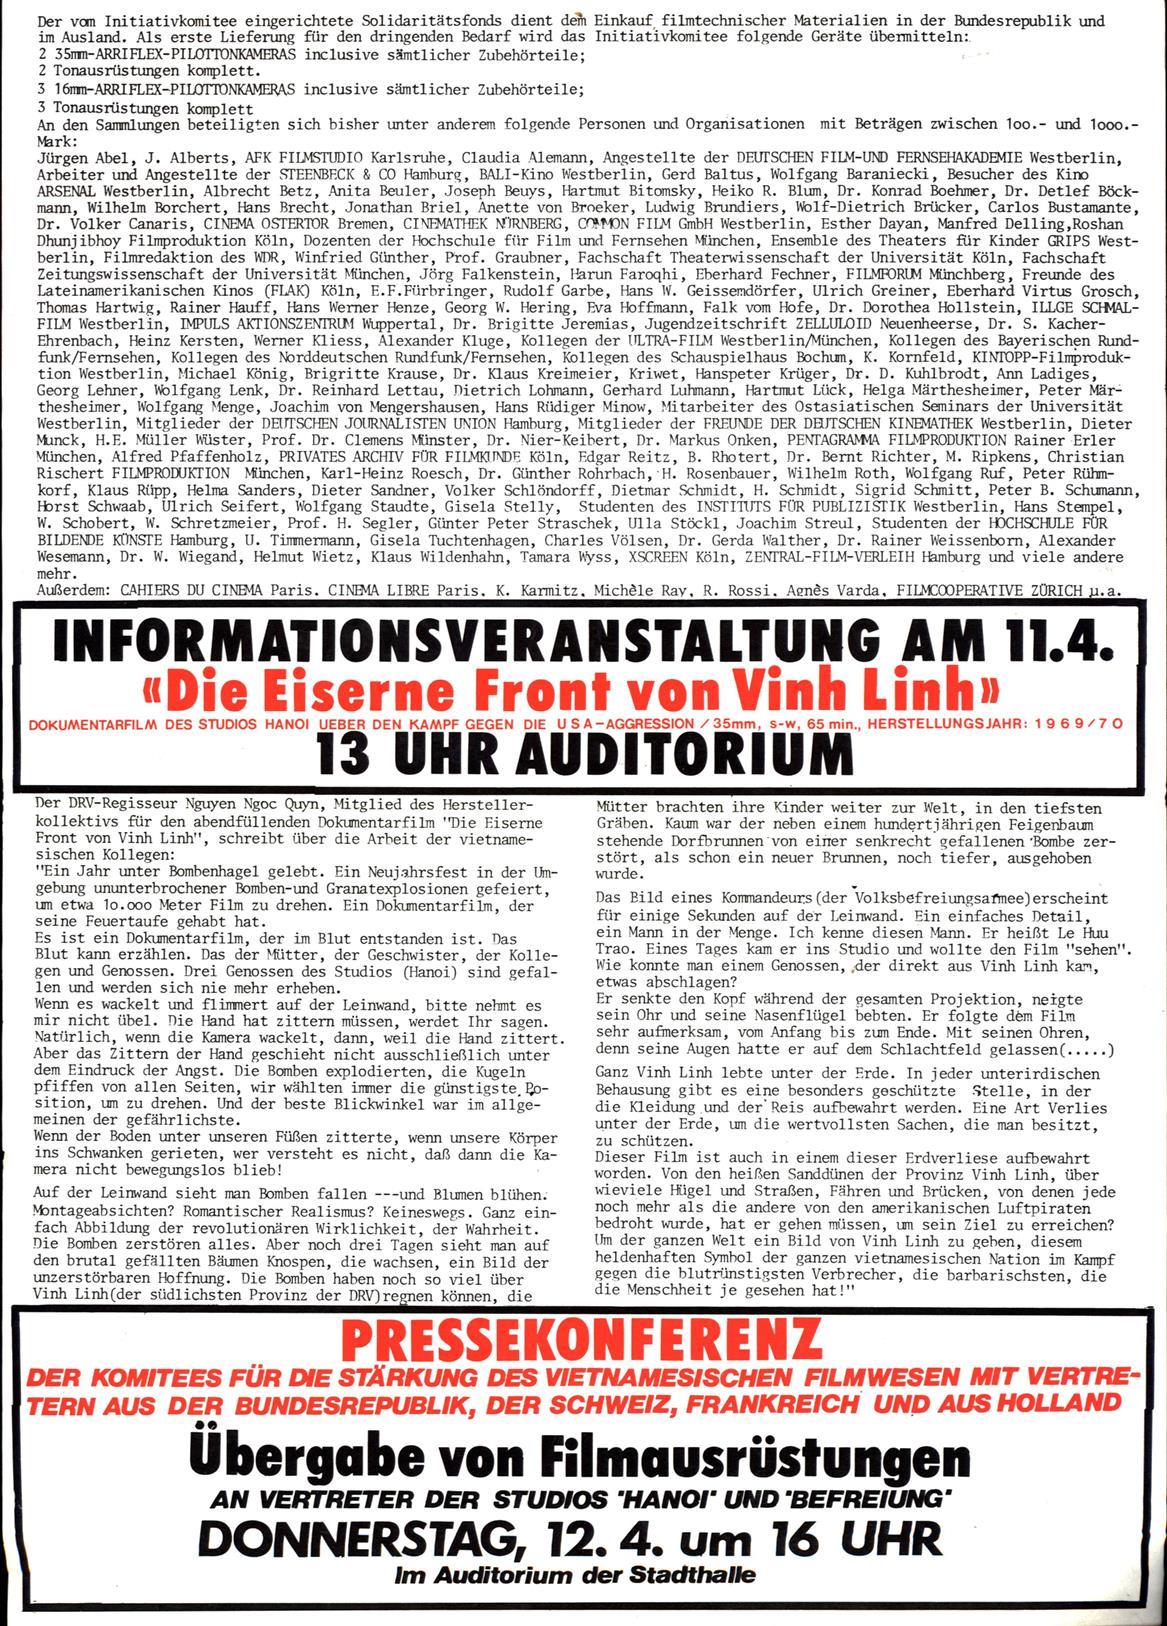 IK_Filmwesen_Bulletin_19730410_Extra_002